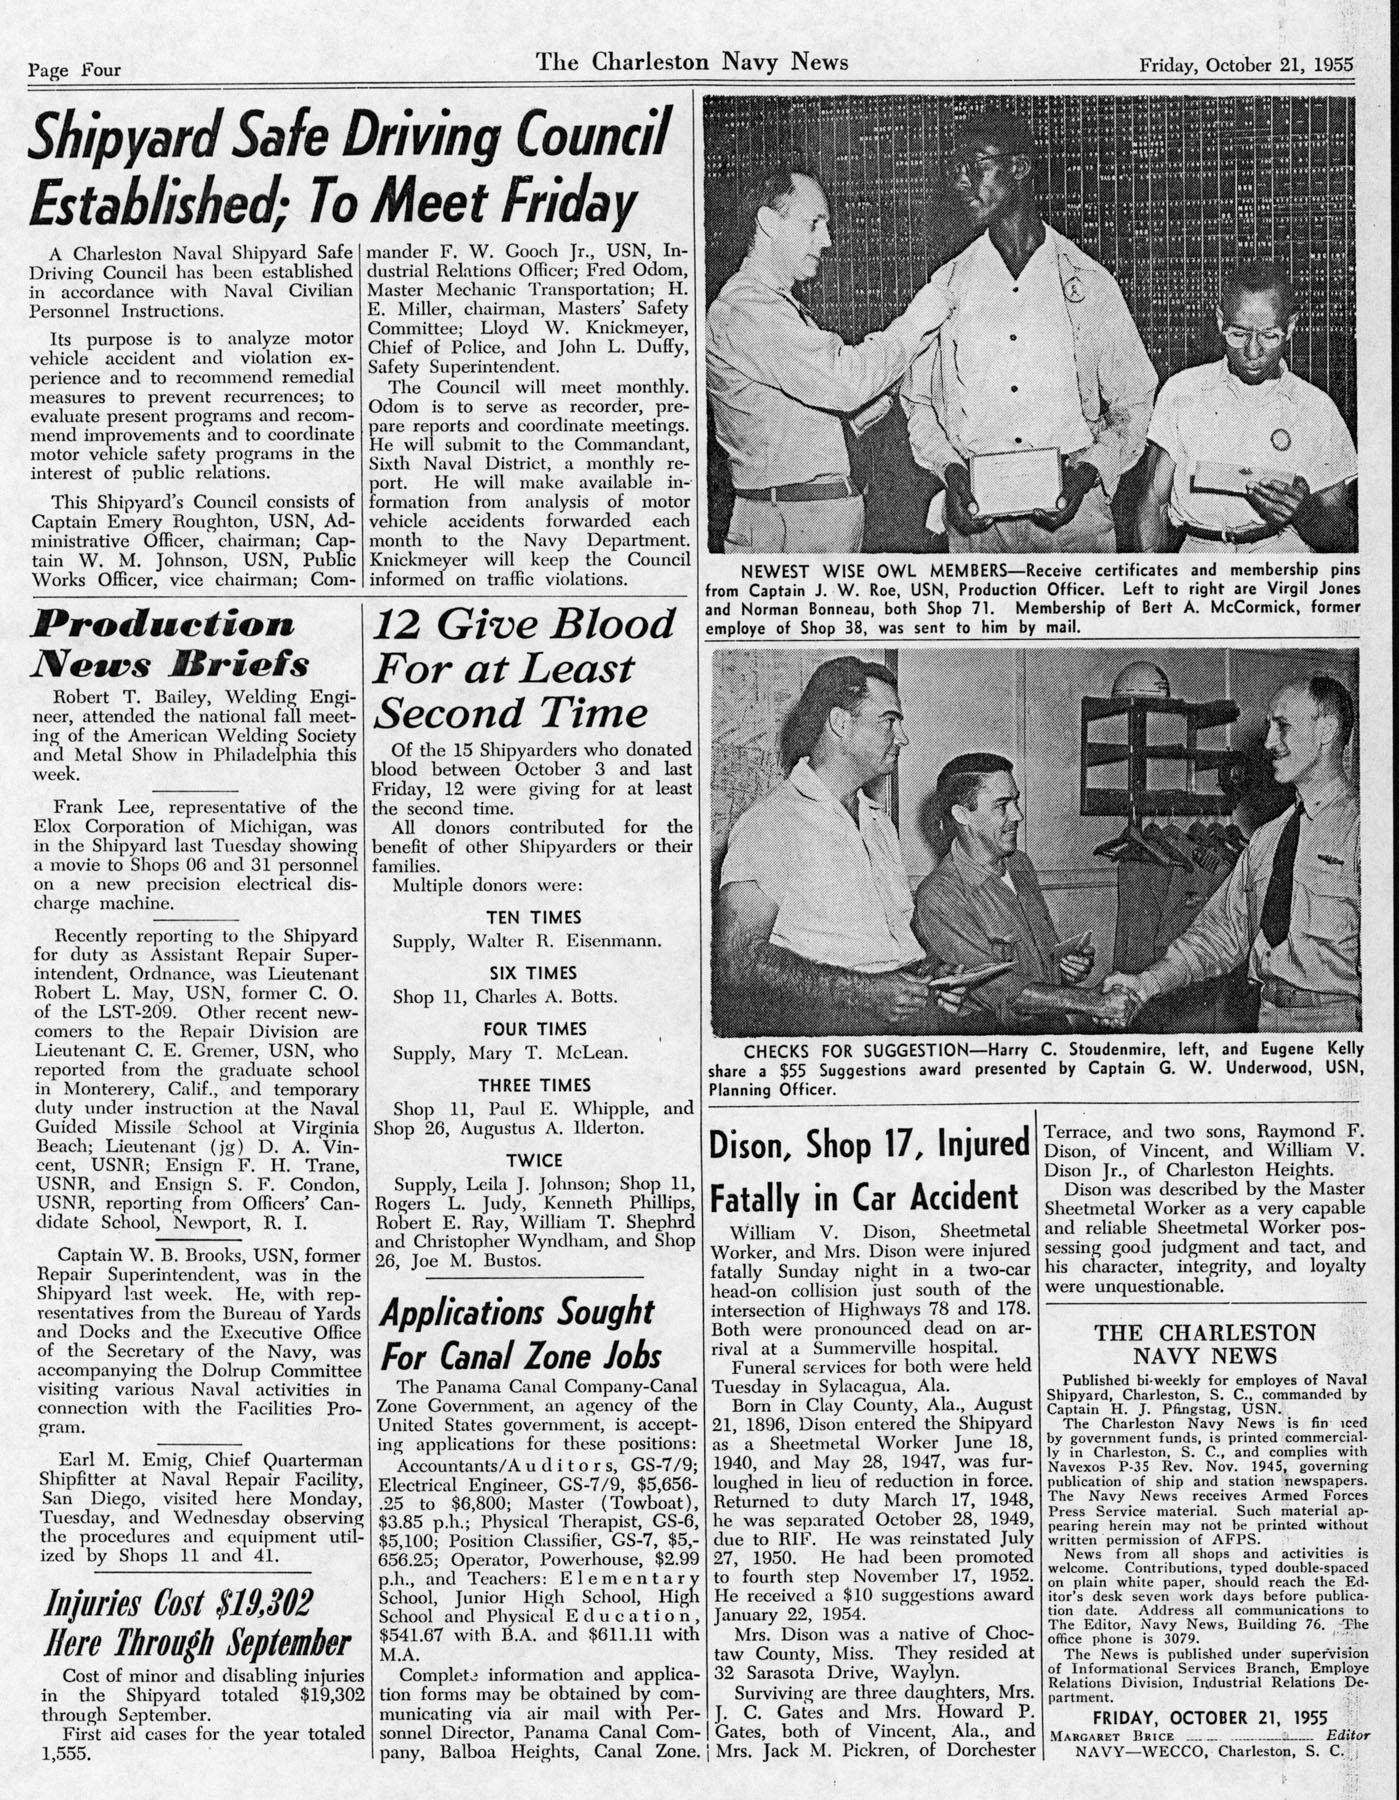 The Charleston Navy News, Volume 14, Edition 7, page iv